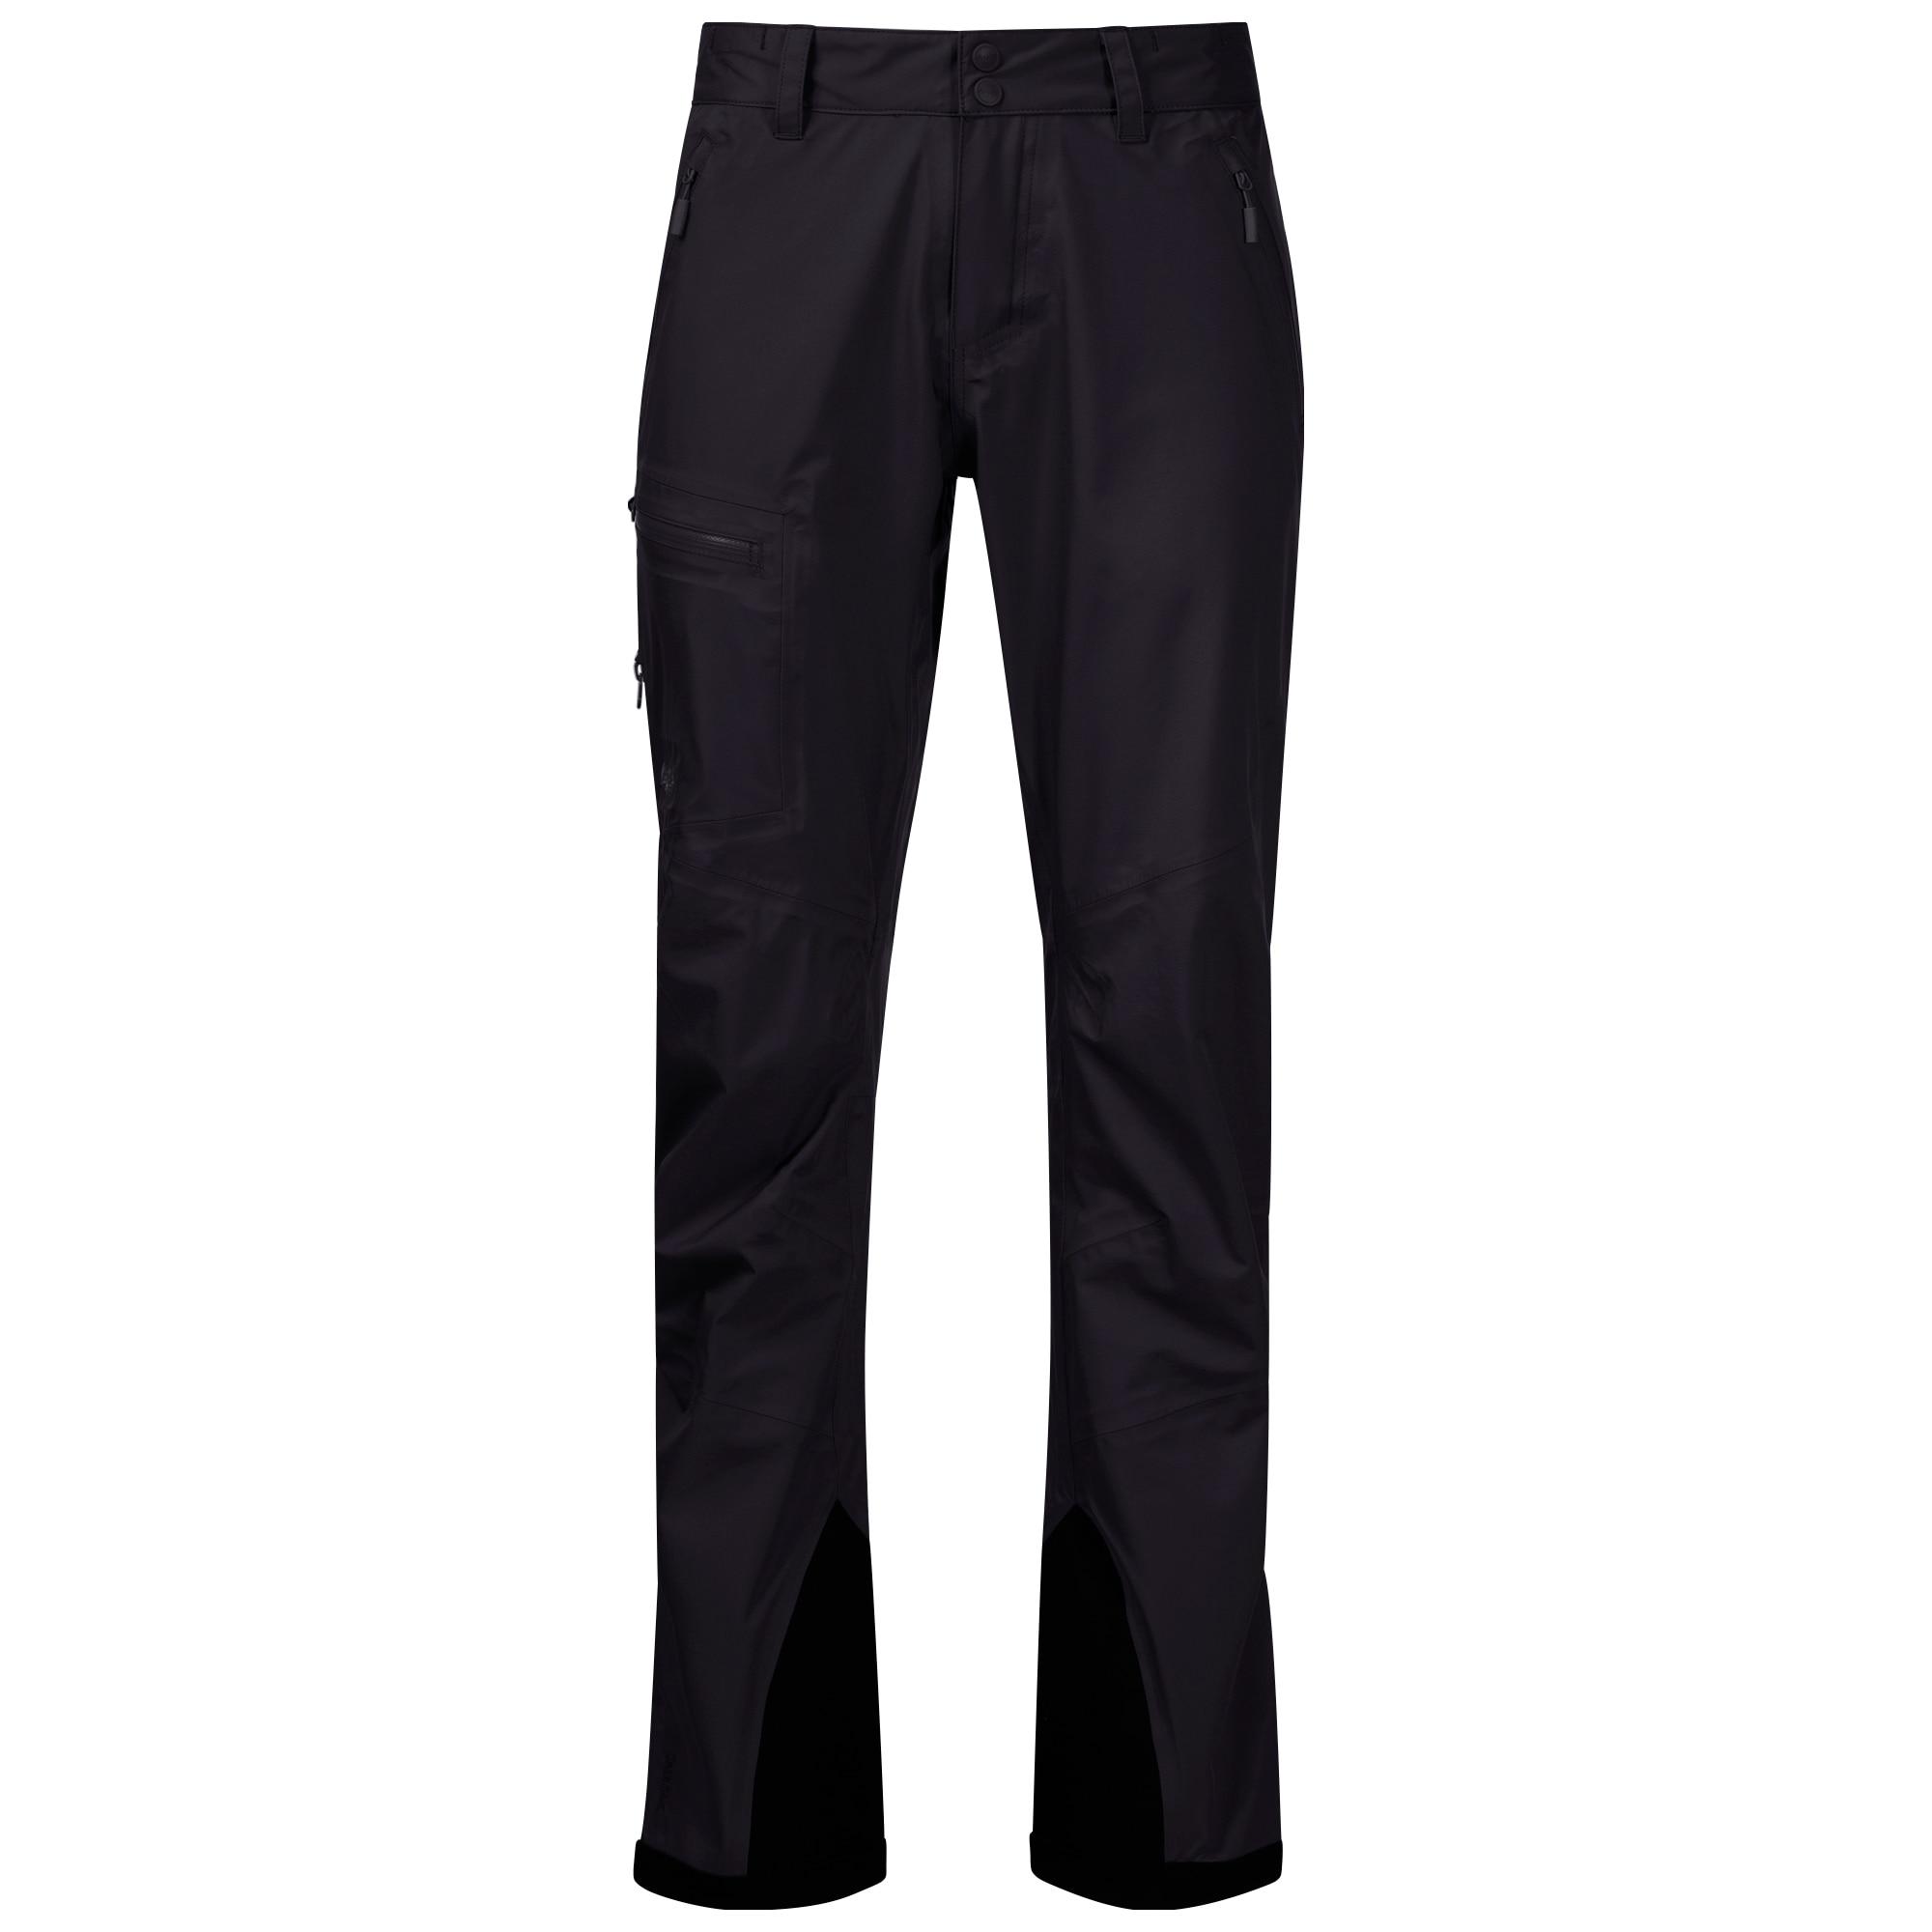 Romsdal 3L LongZip W Pants